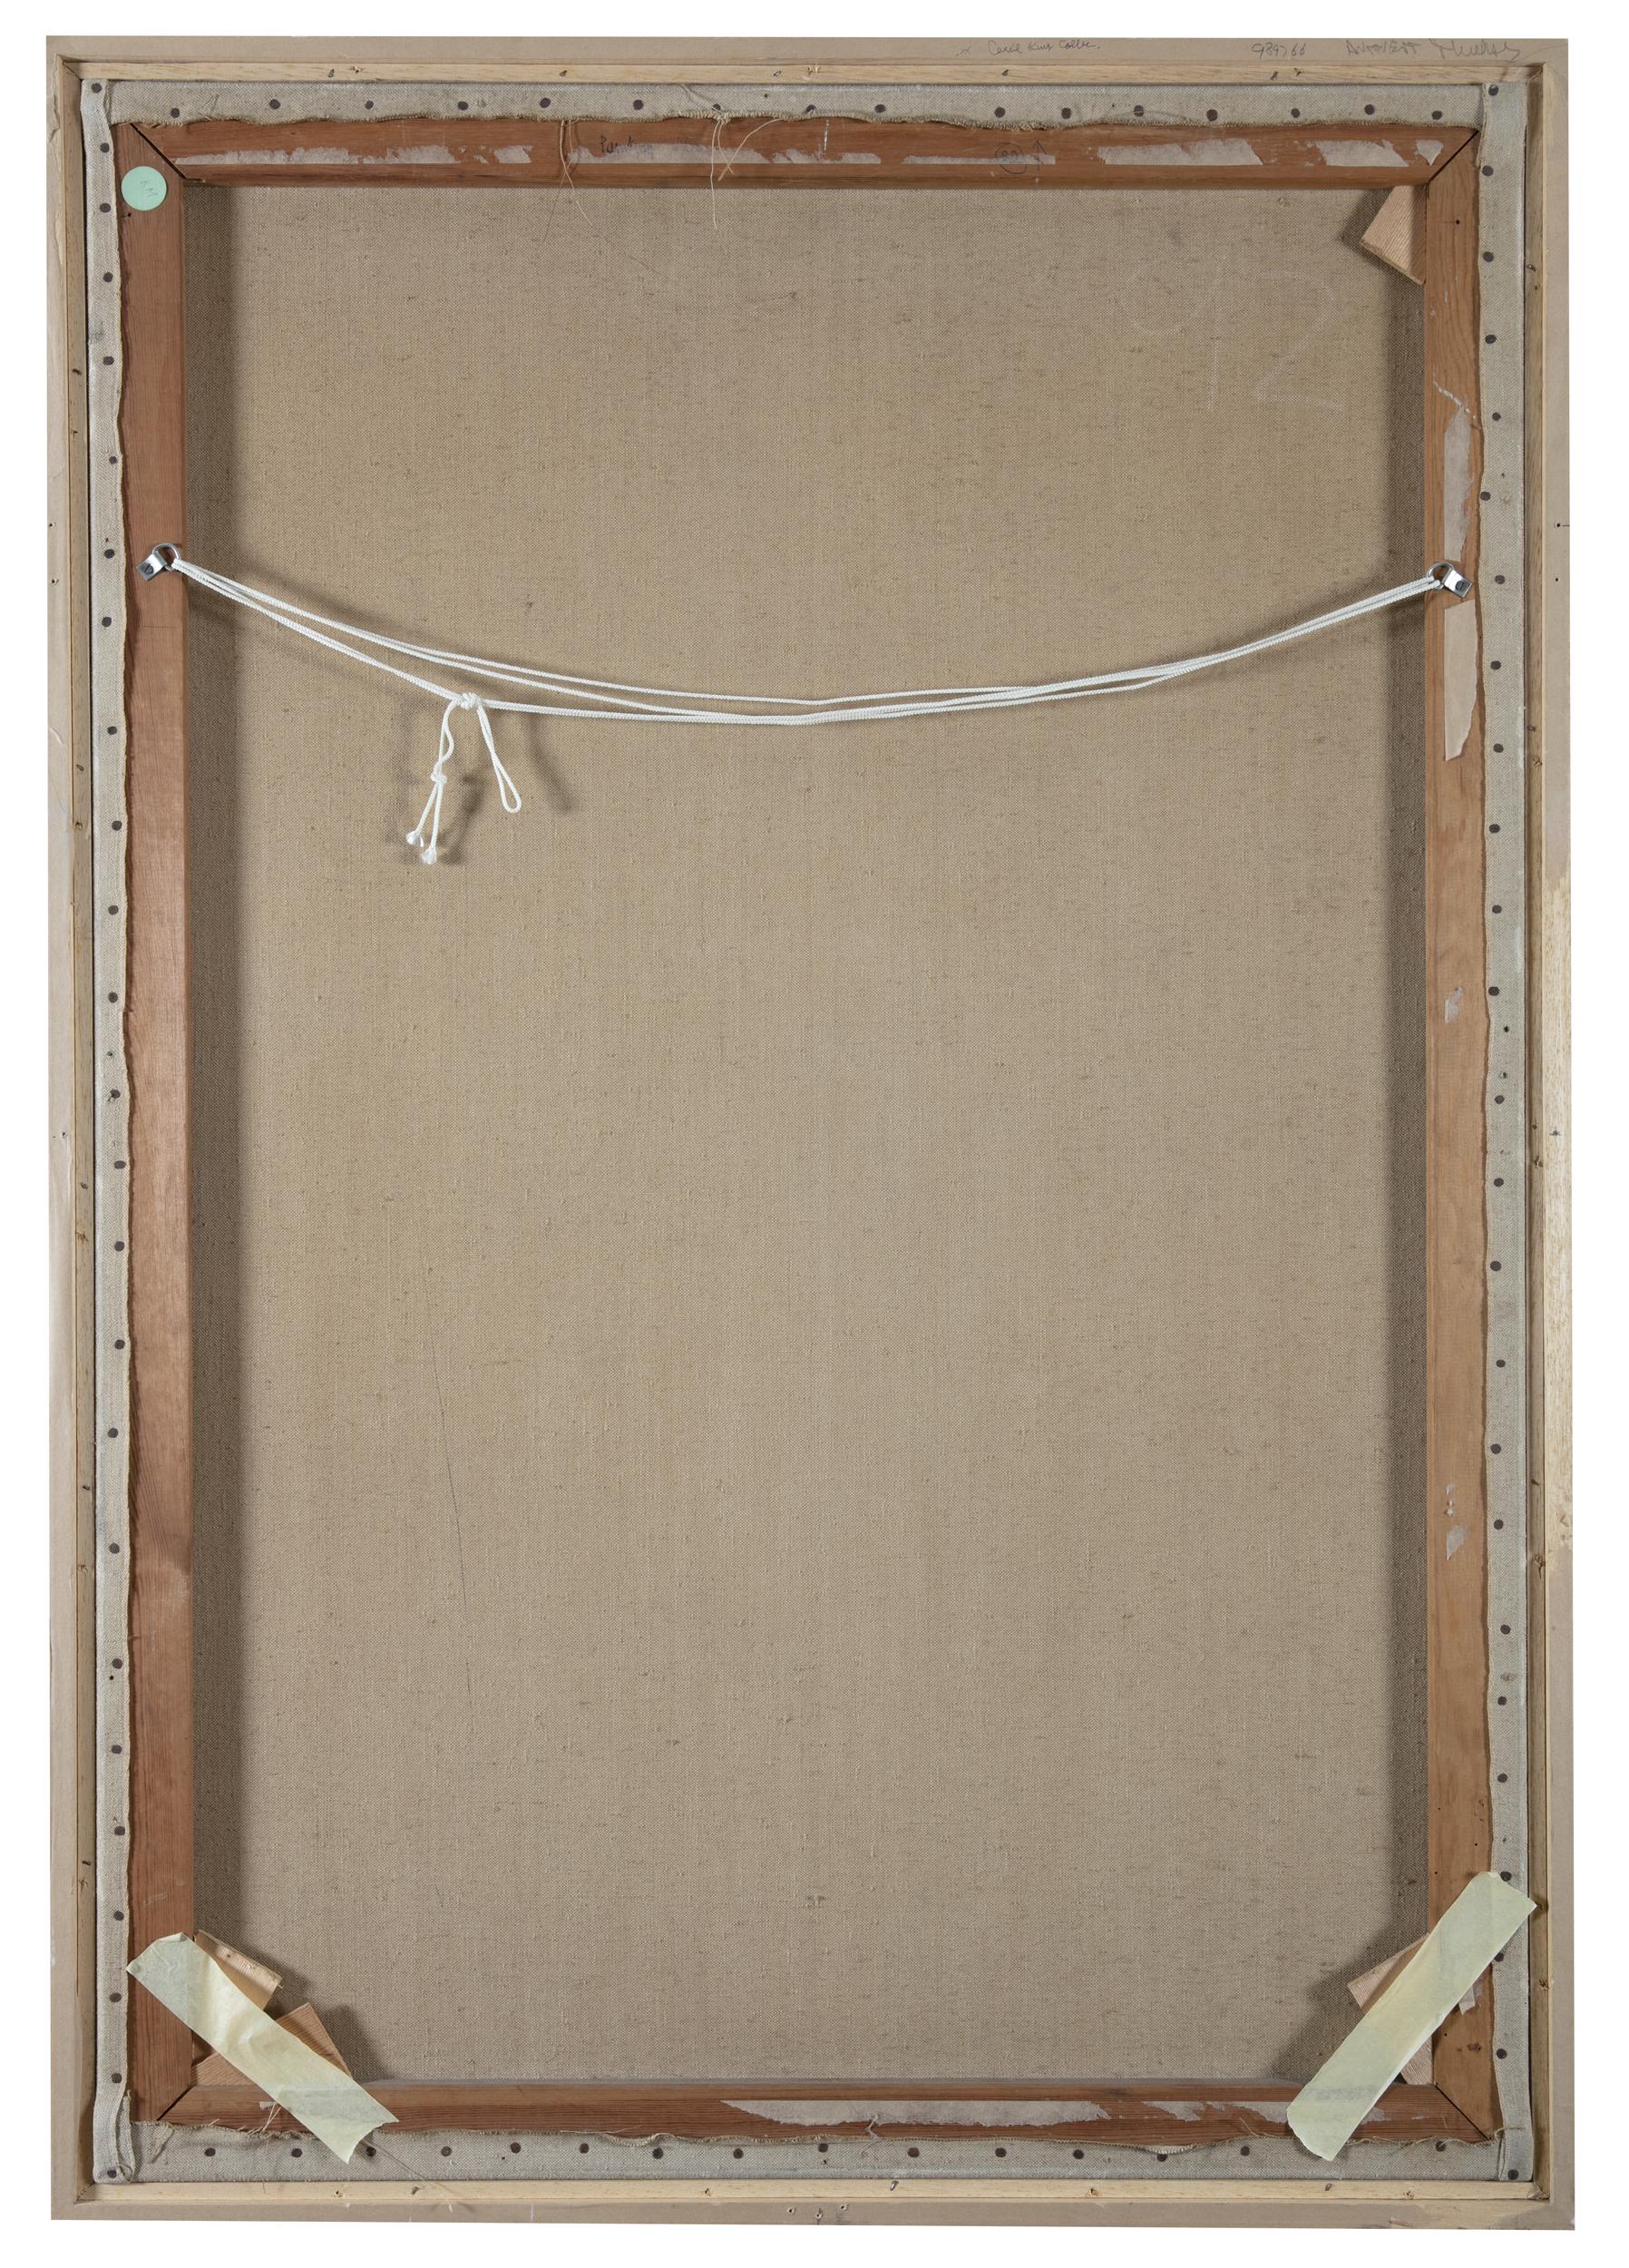 Lot 88 - Patrick Scott HRHA (1921-2014)Bog Cotton (1962)Tempera on linen, 122 x 83cm (48 x 32½)Inscribed '